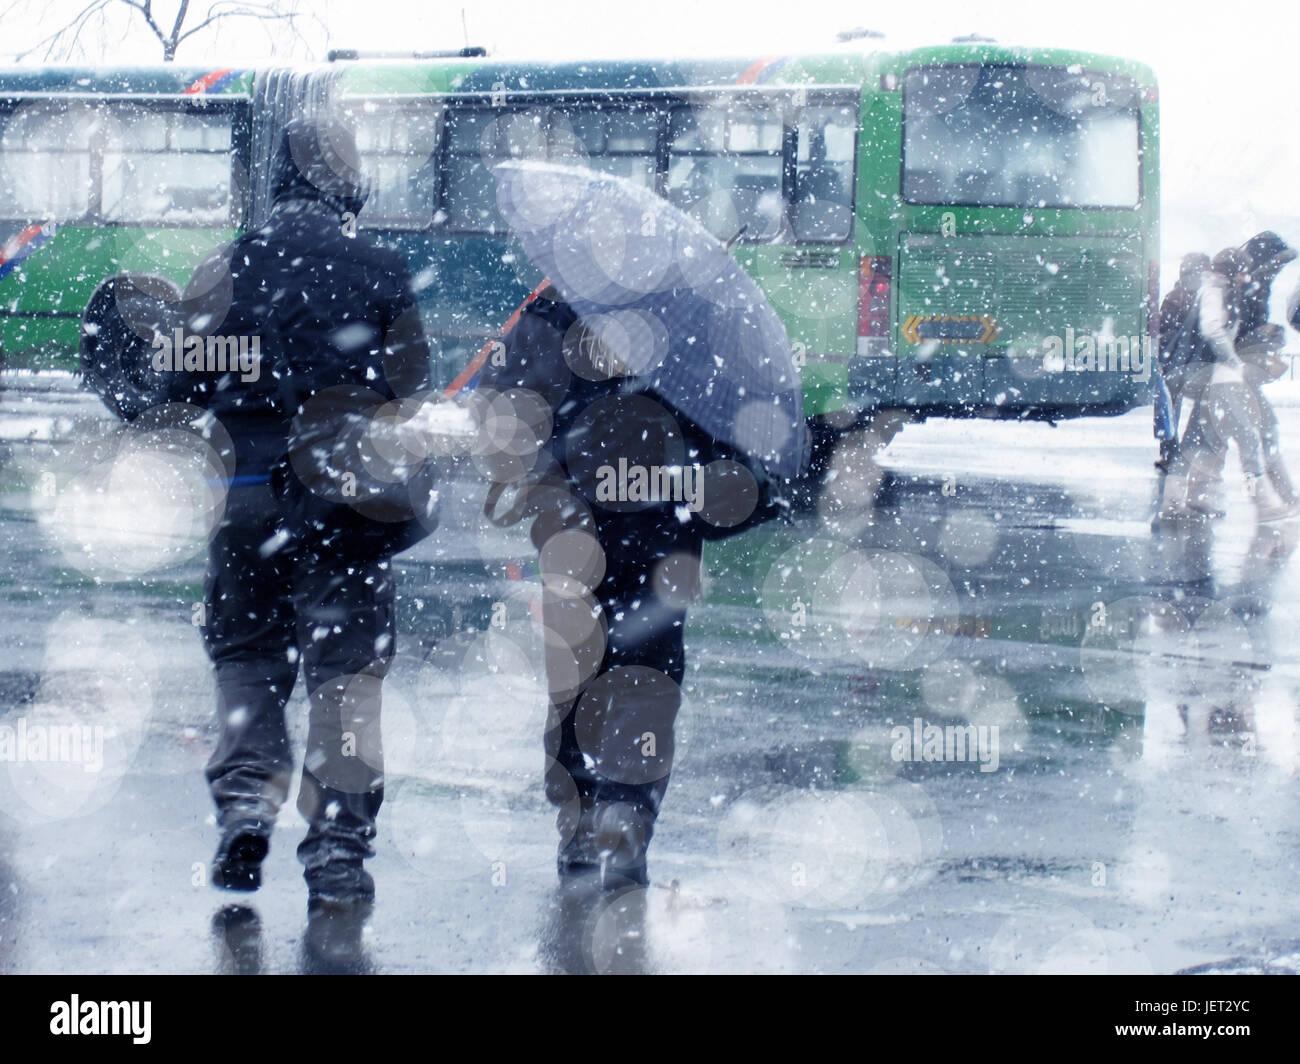 people walking on city street under snowing - Stock Image